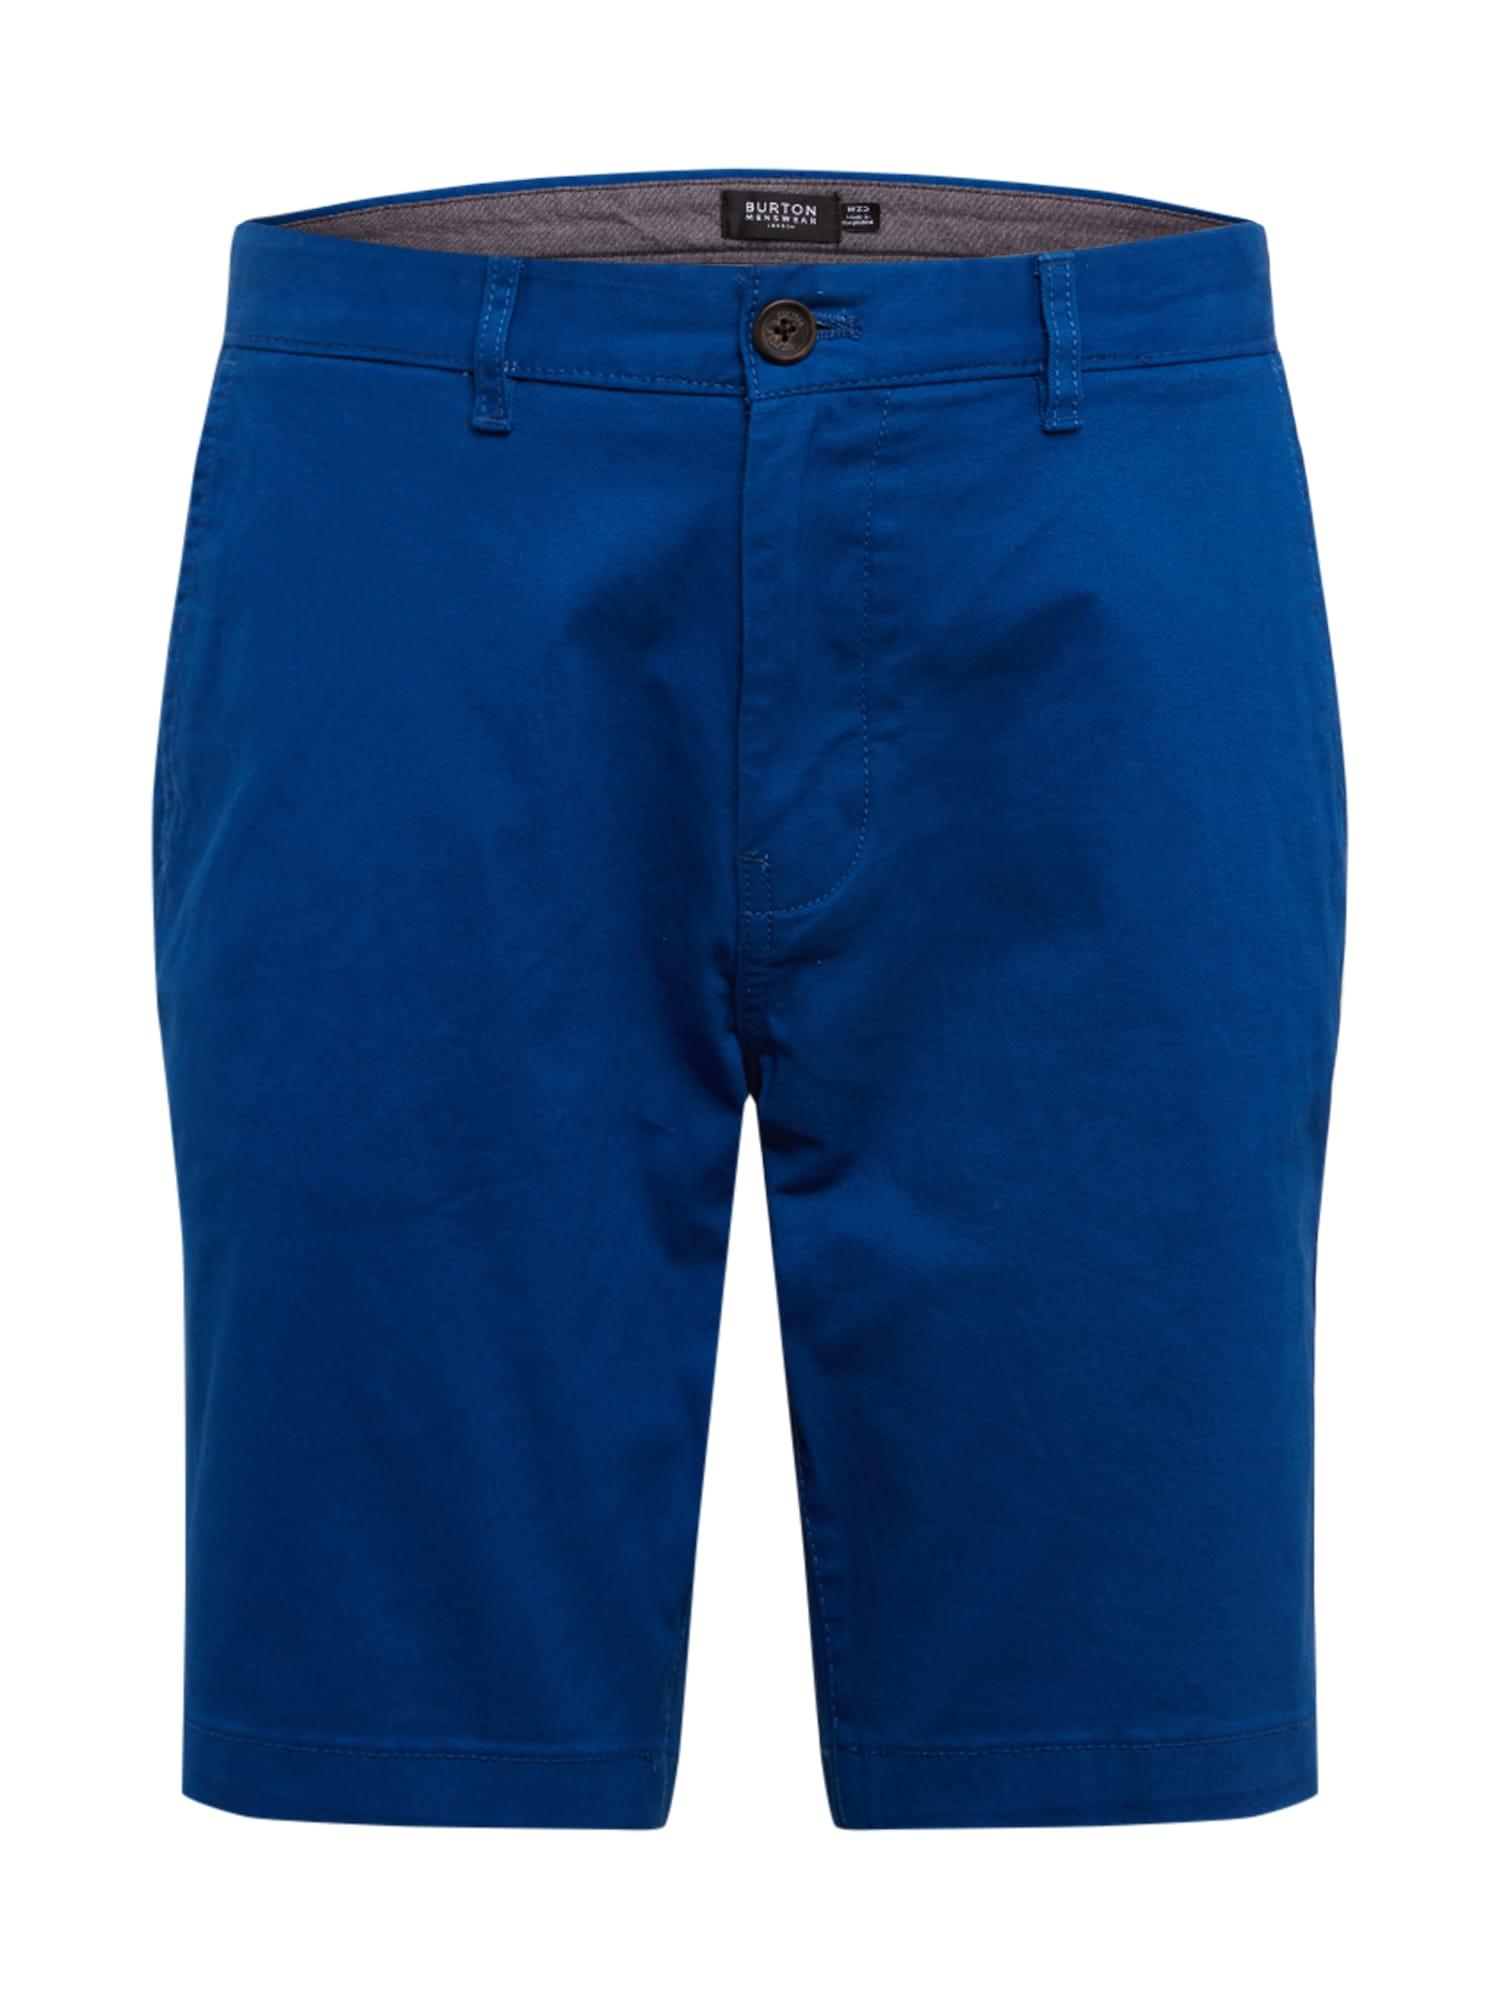 BURTON MENSWEAR LONDON Chino stiliaus kelnės 'MOROCCAN BLU CHINO S' mėlyna